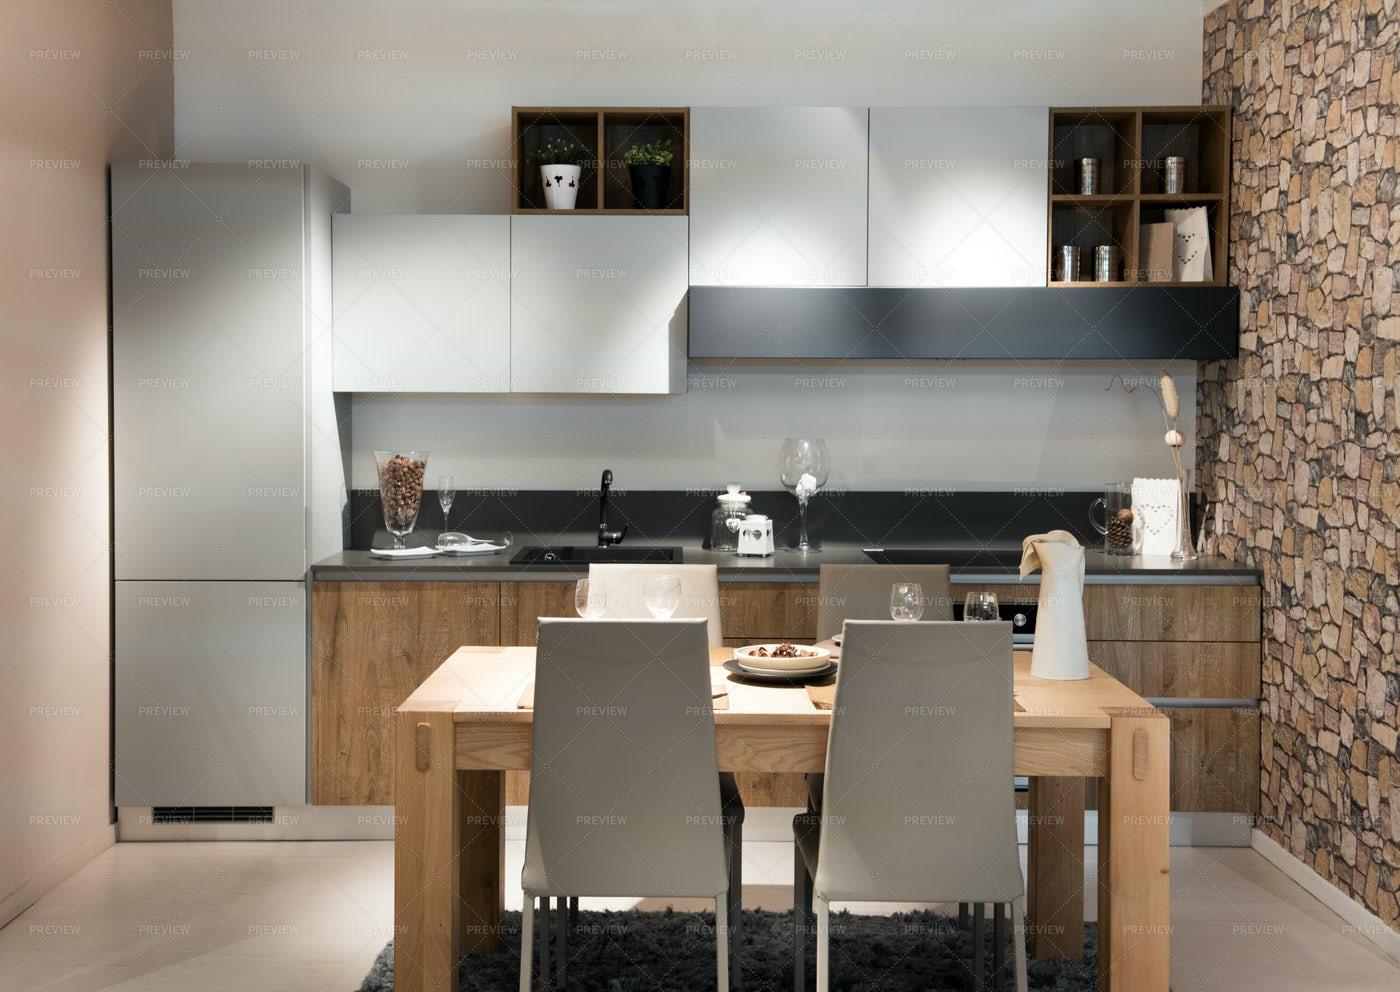 Compact Modern Kitchen Design: Stock Photos